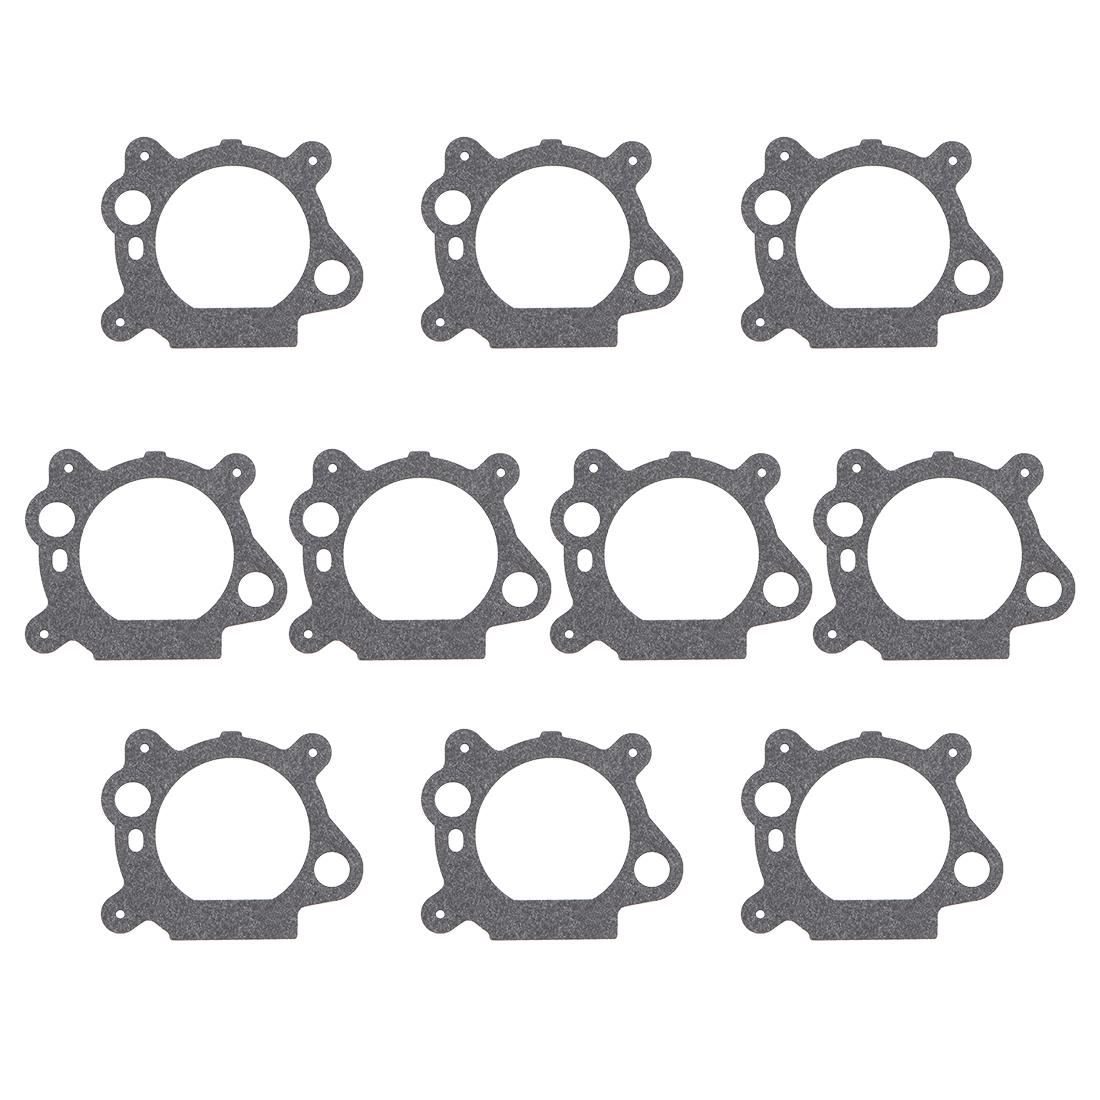 795629 Carburetor Rebuild Kit for Briggs and Stratton 272653 272653S Carb 10pcs